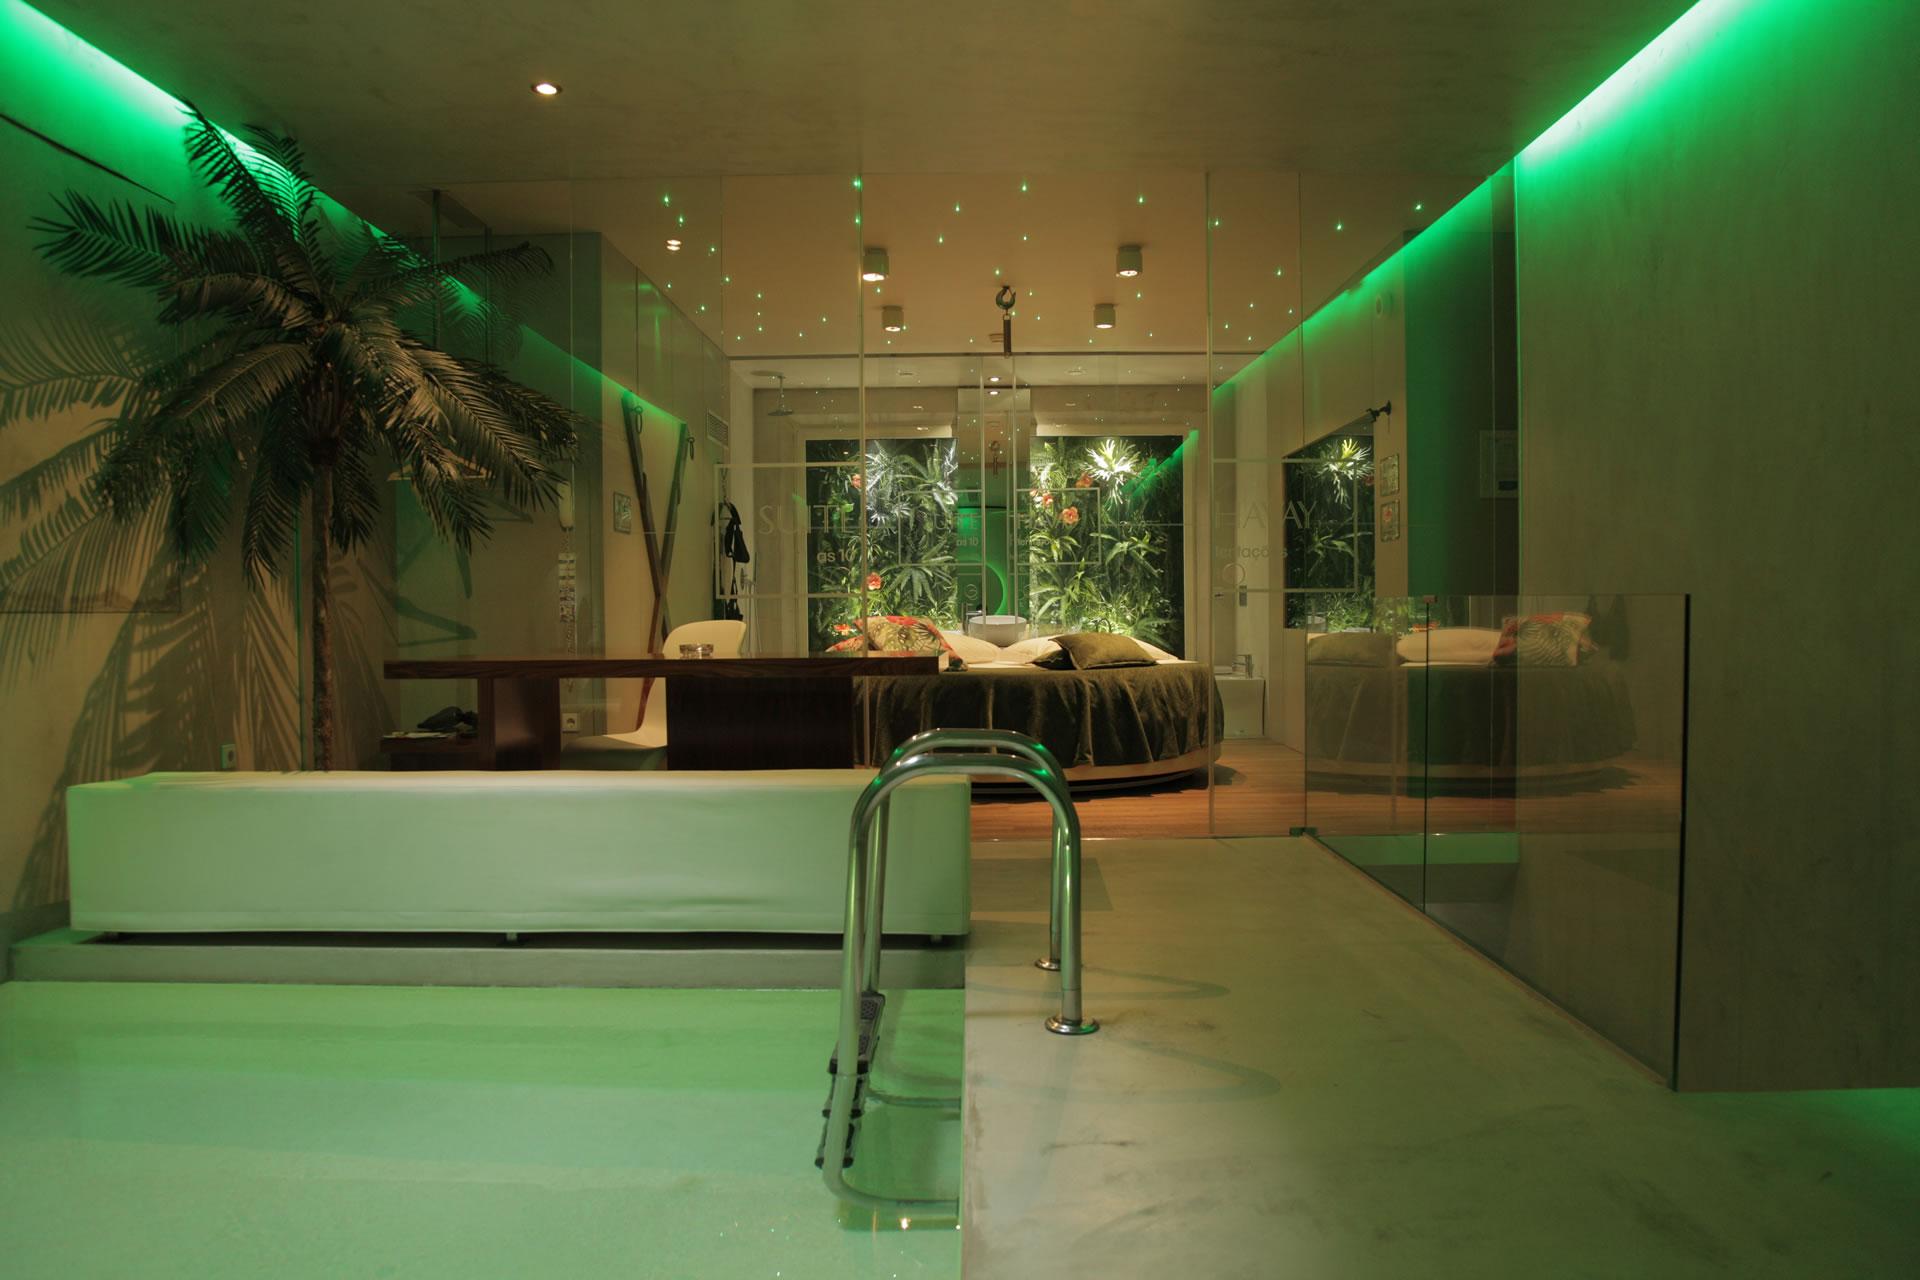 Suite Havay avec piscine privee du Motel Havay - Matosinhos - Porto